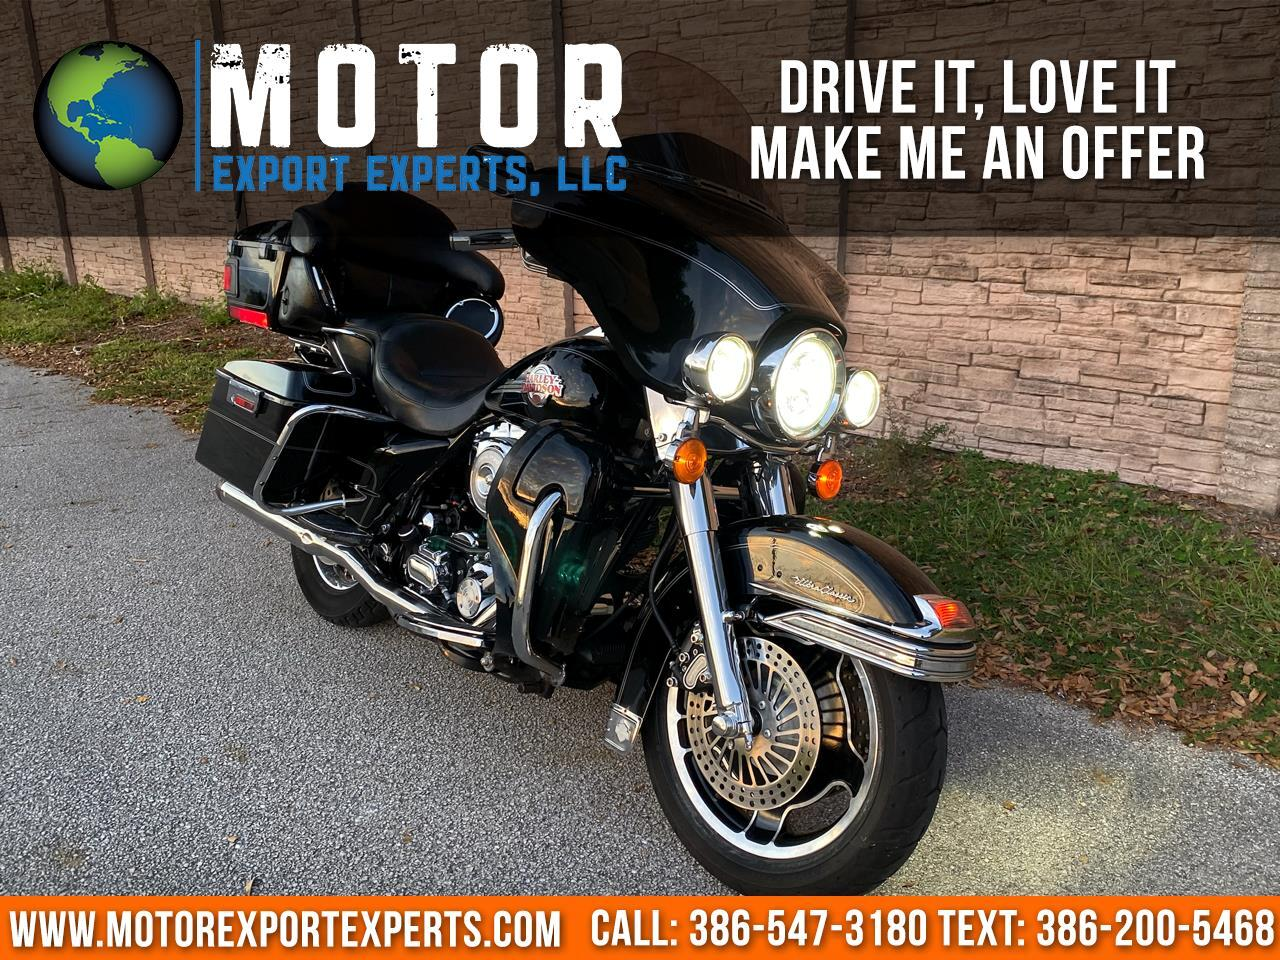 2005 Harley-Davidson FLHTCUI ULTRA CLASSIC